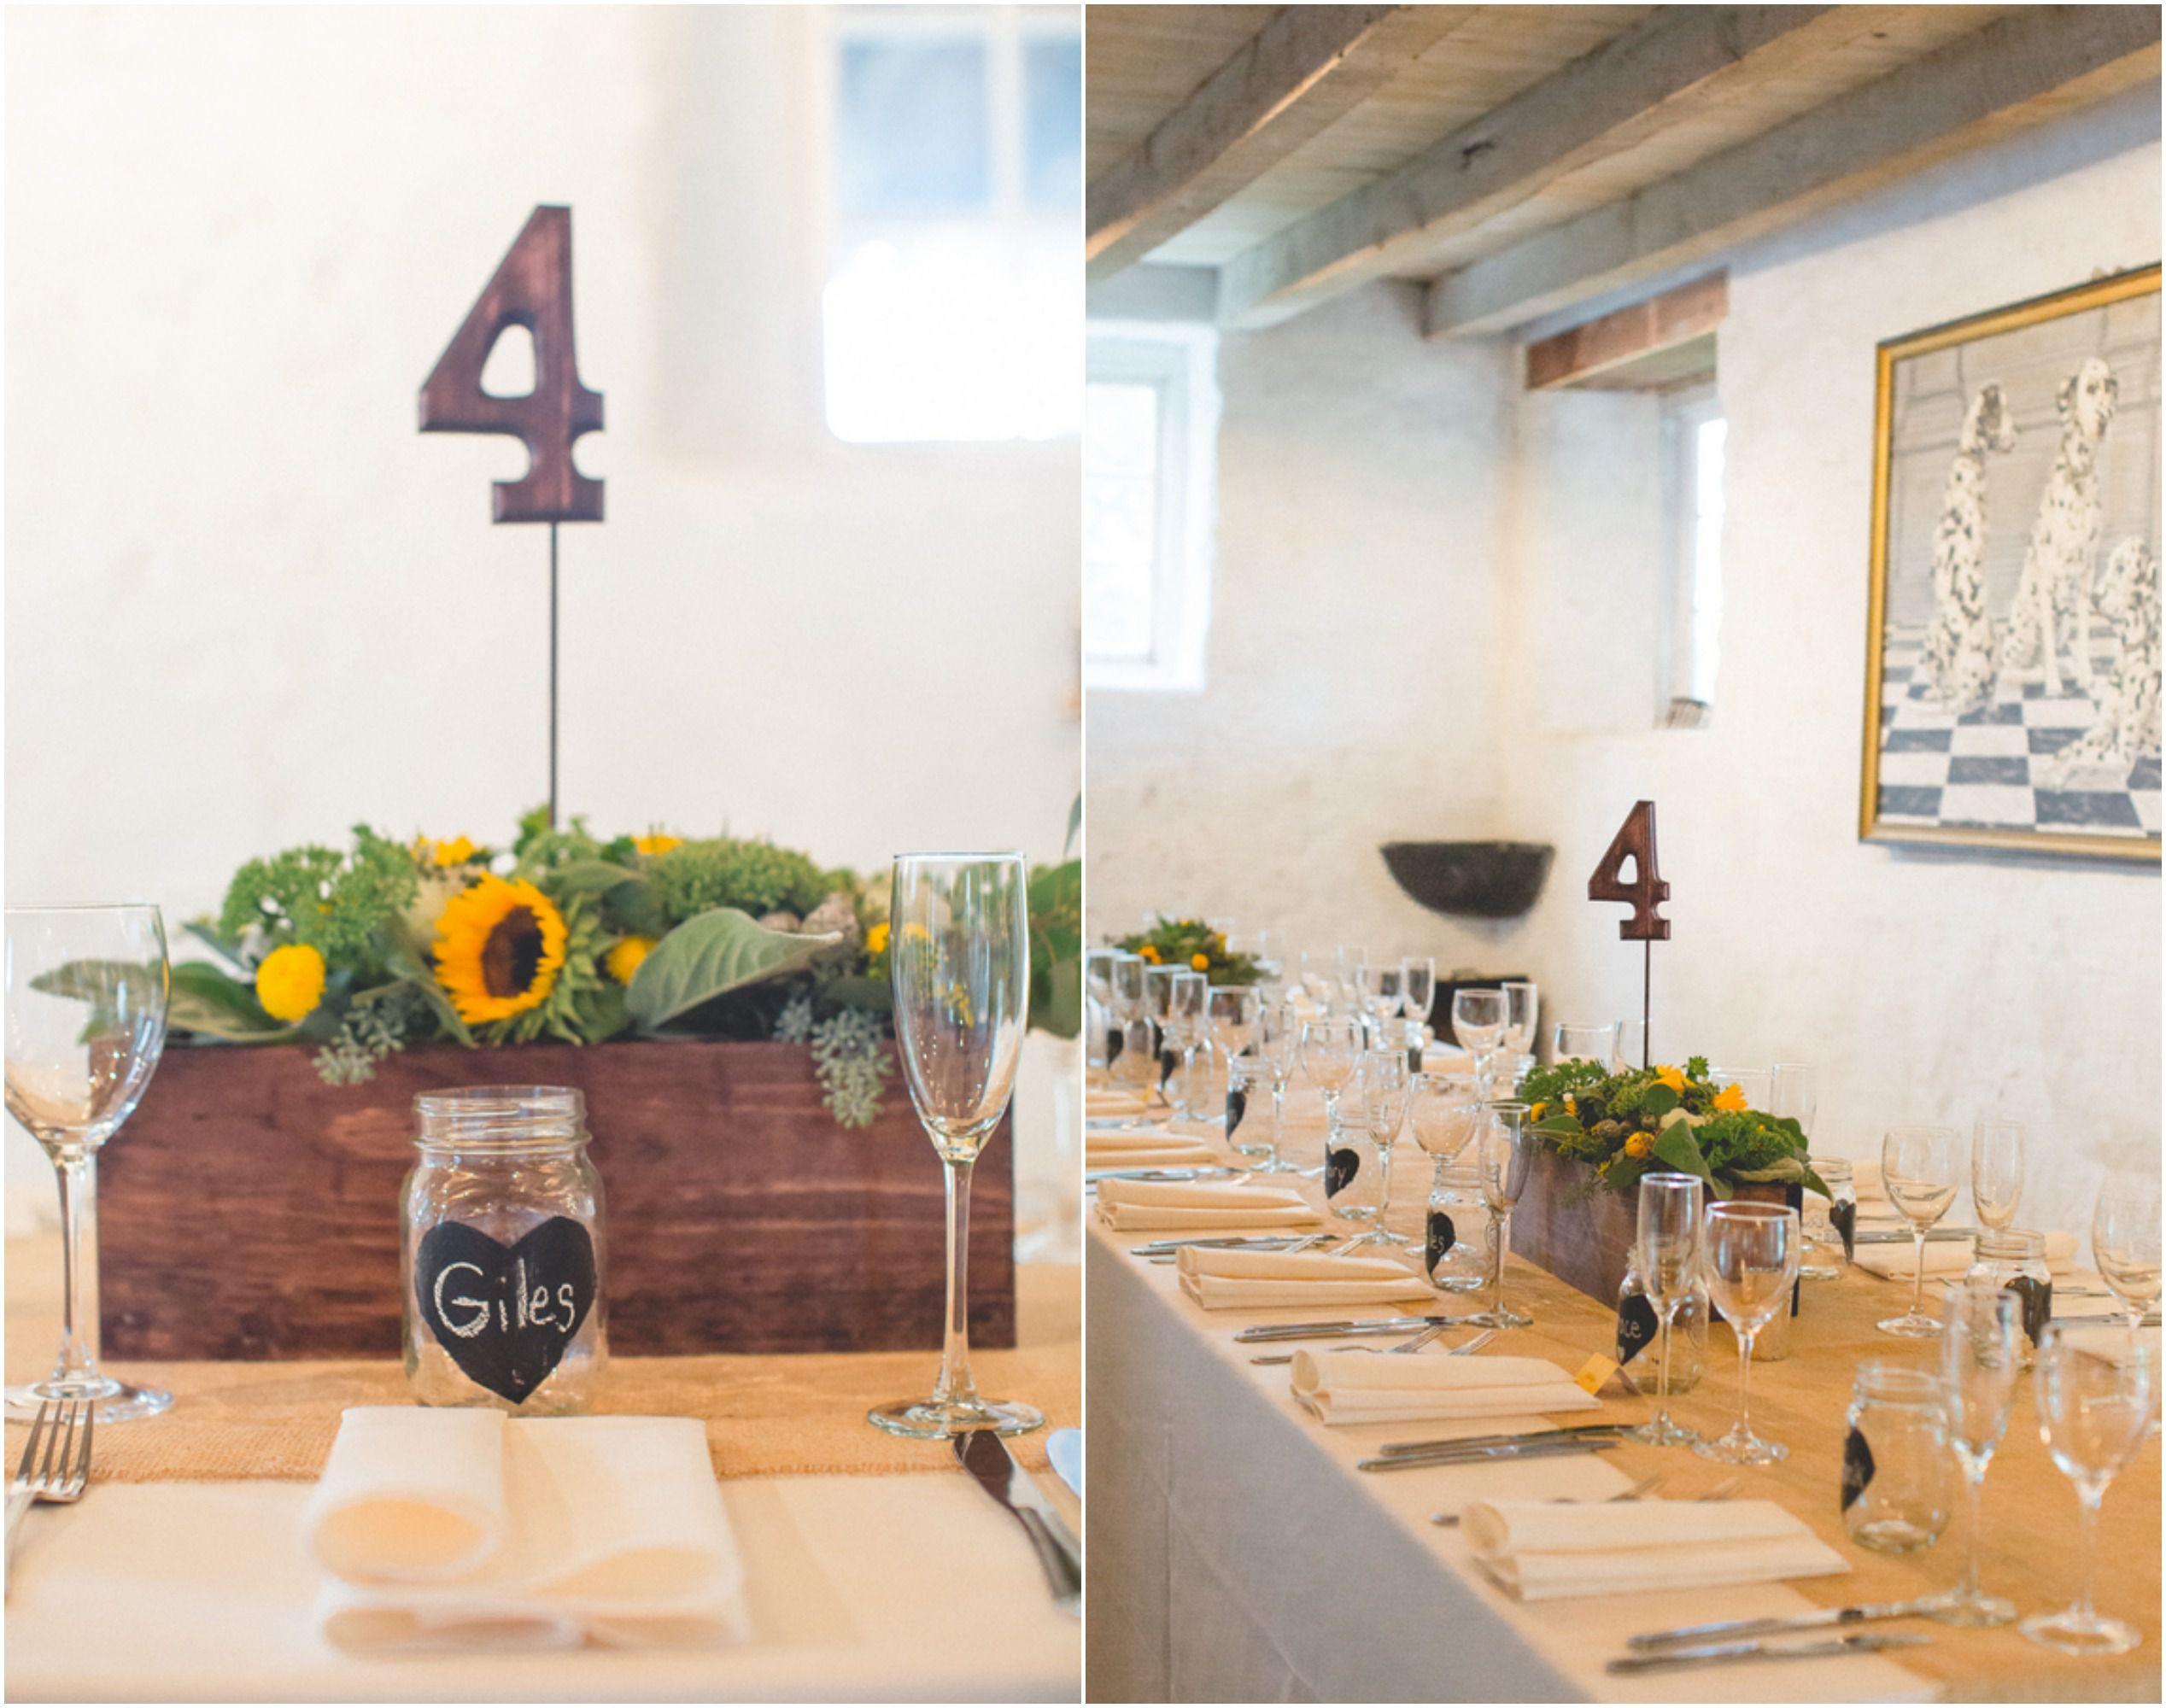 Rustic Wedding Table Settings